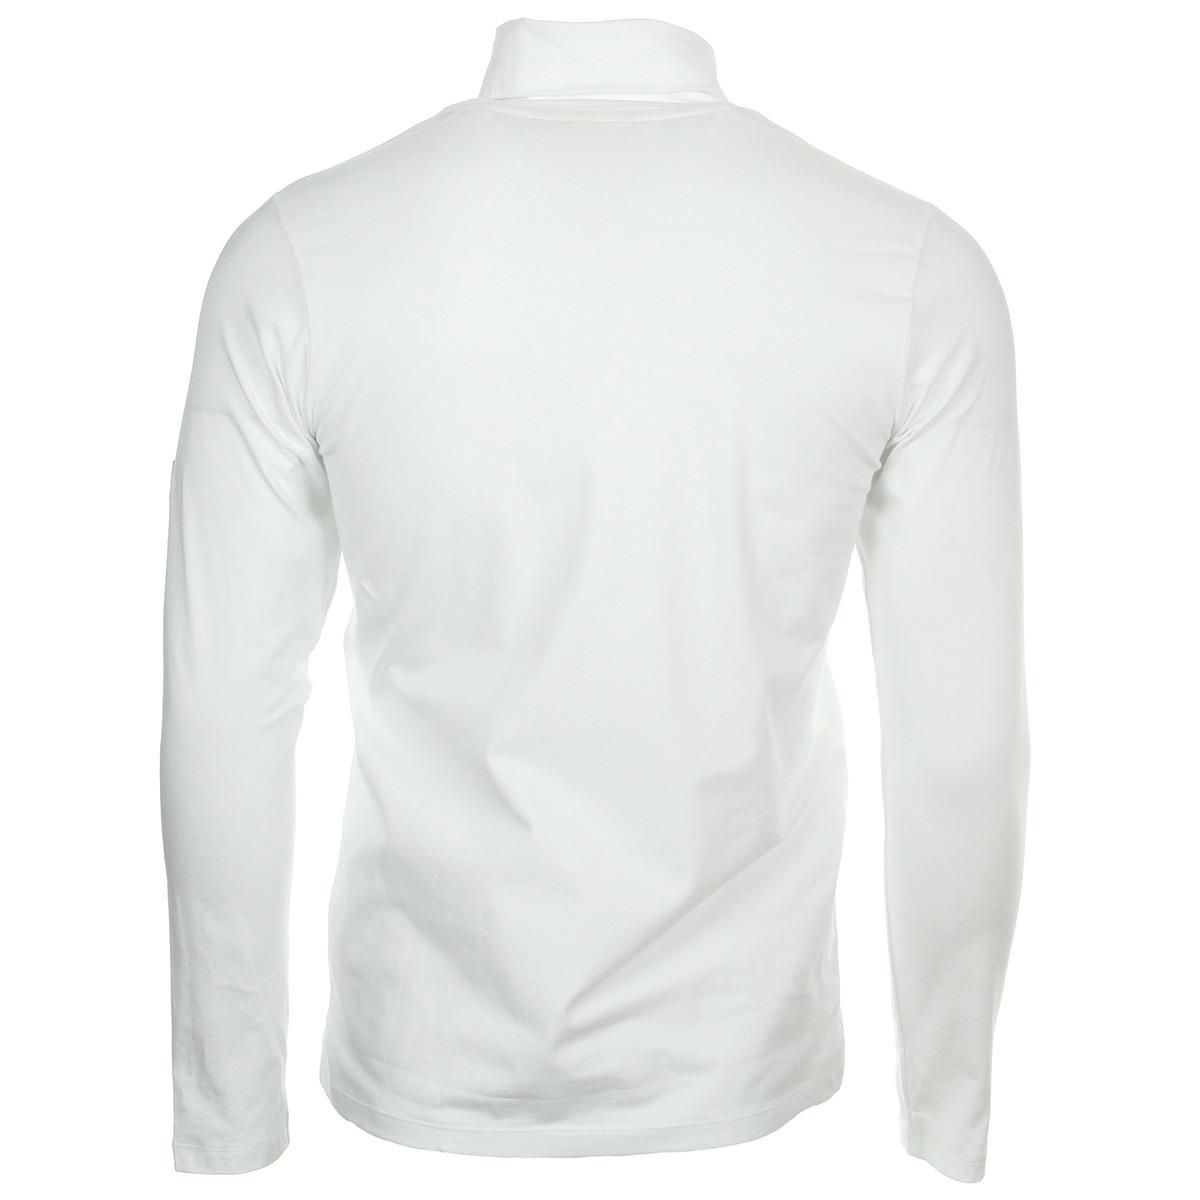 Fila Roll Neck White 684207001, T-Shirts